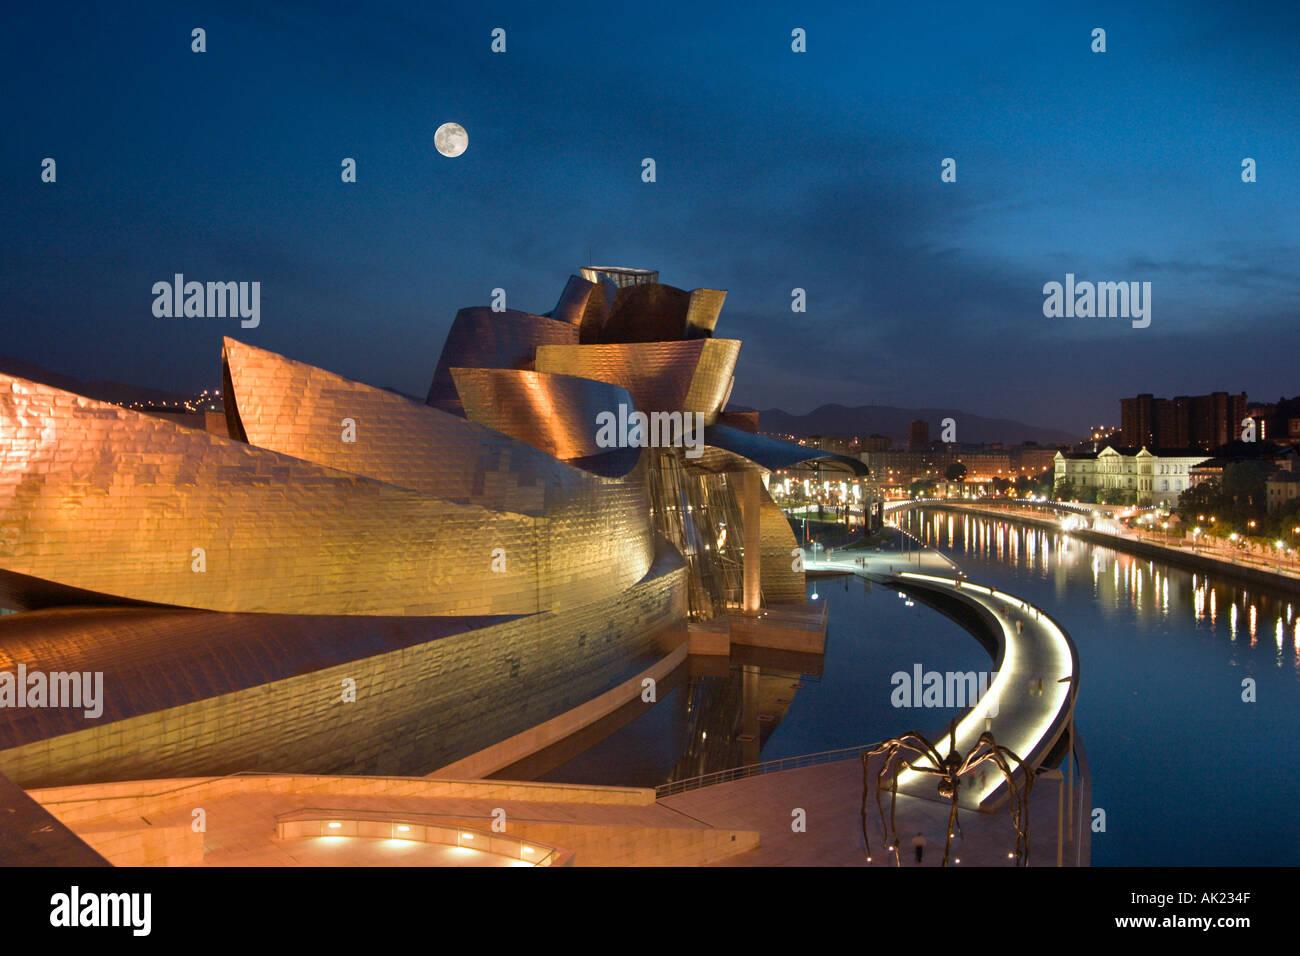 Guggenheim Museum at night, Bilbao, Basque Country, Spain - Stock Image